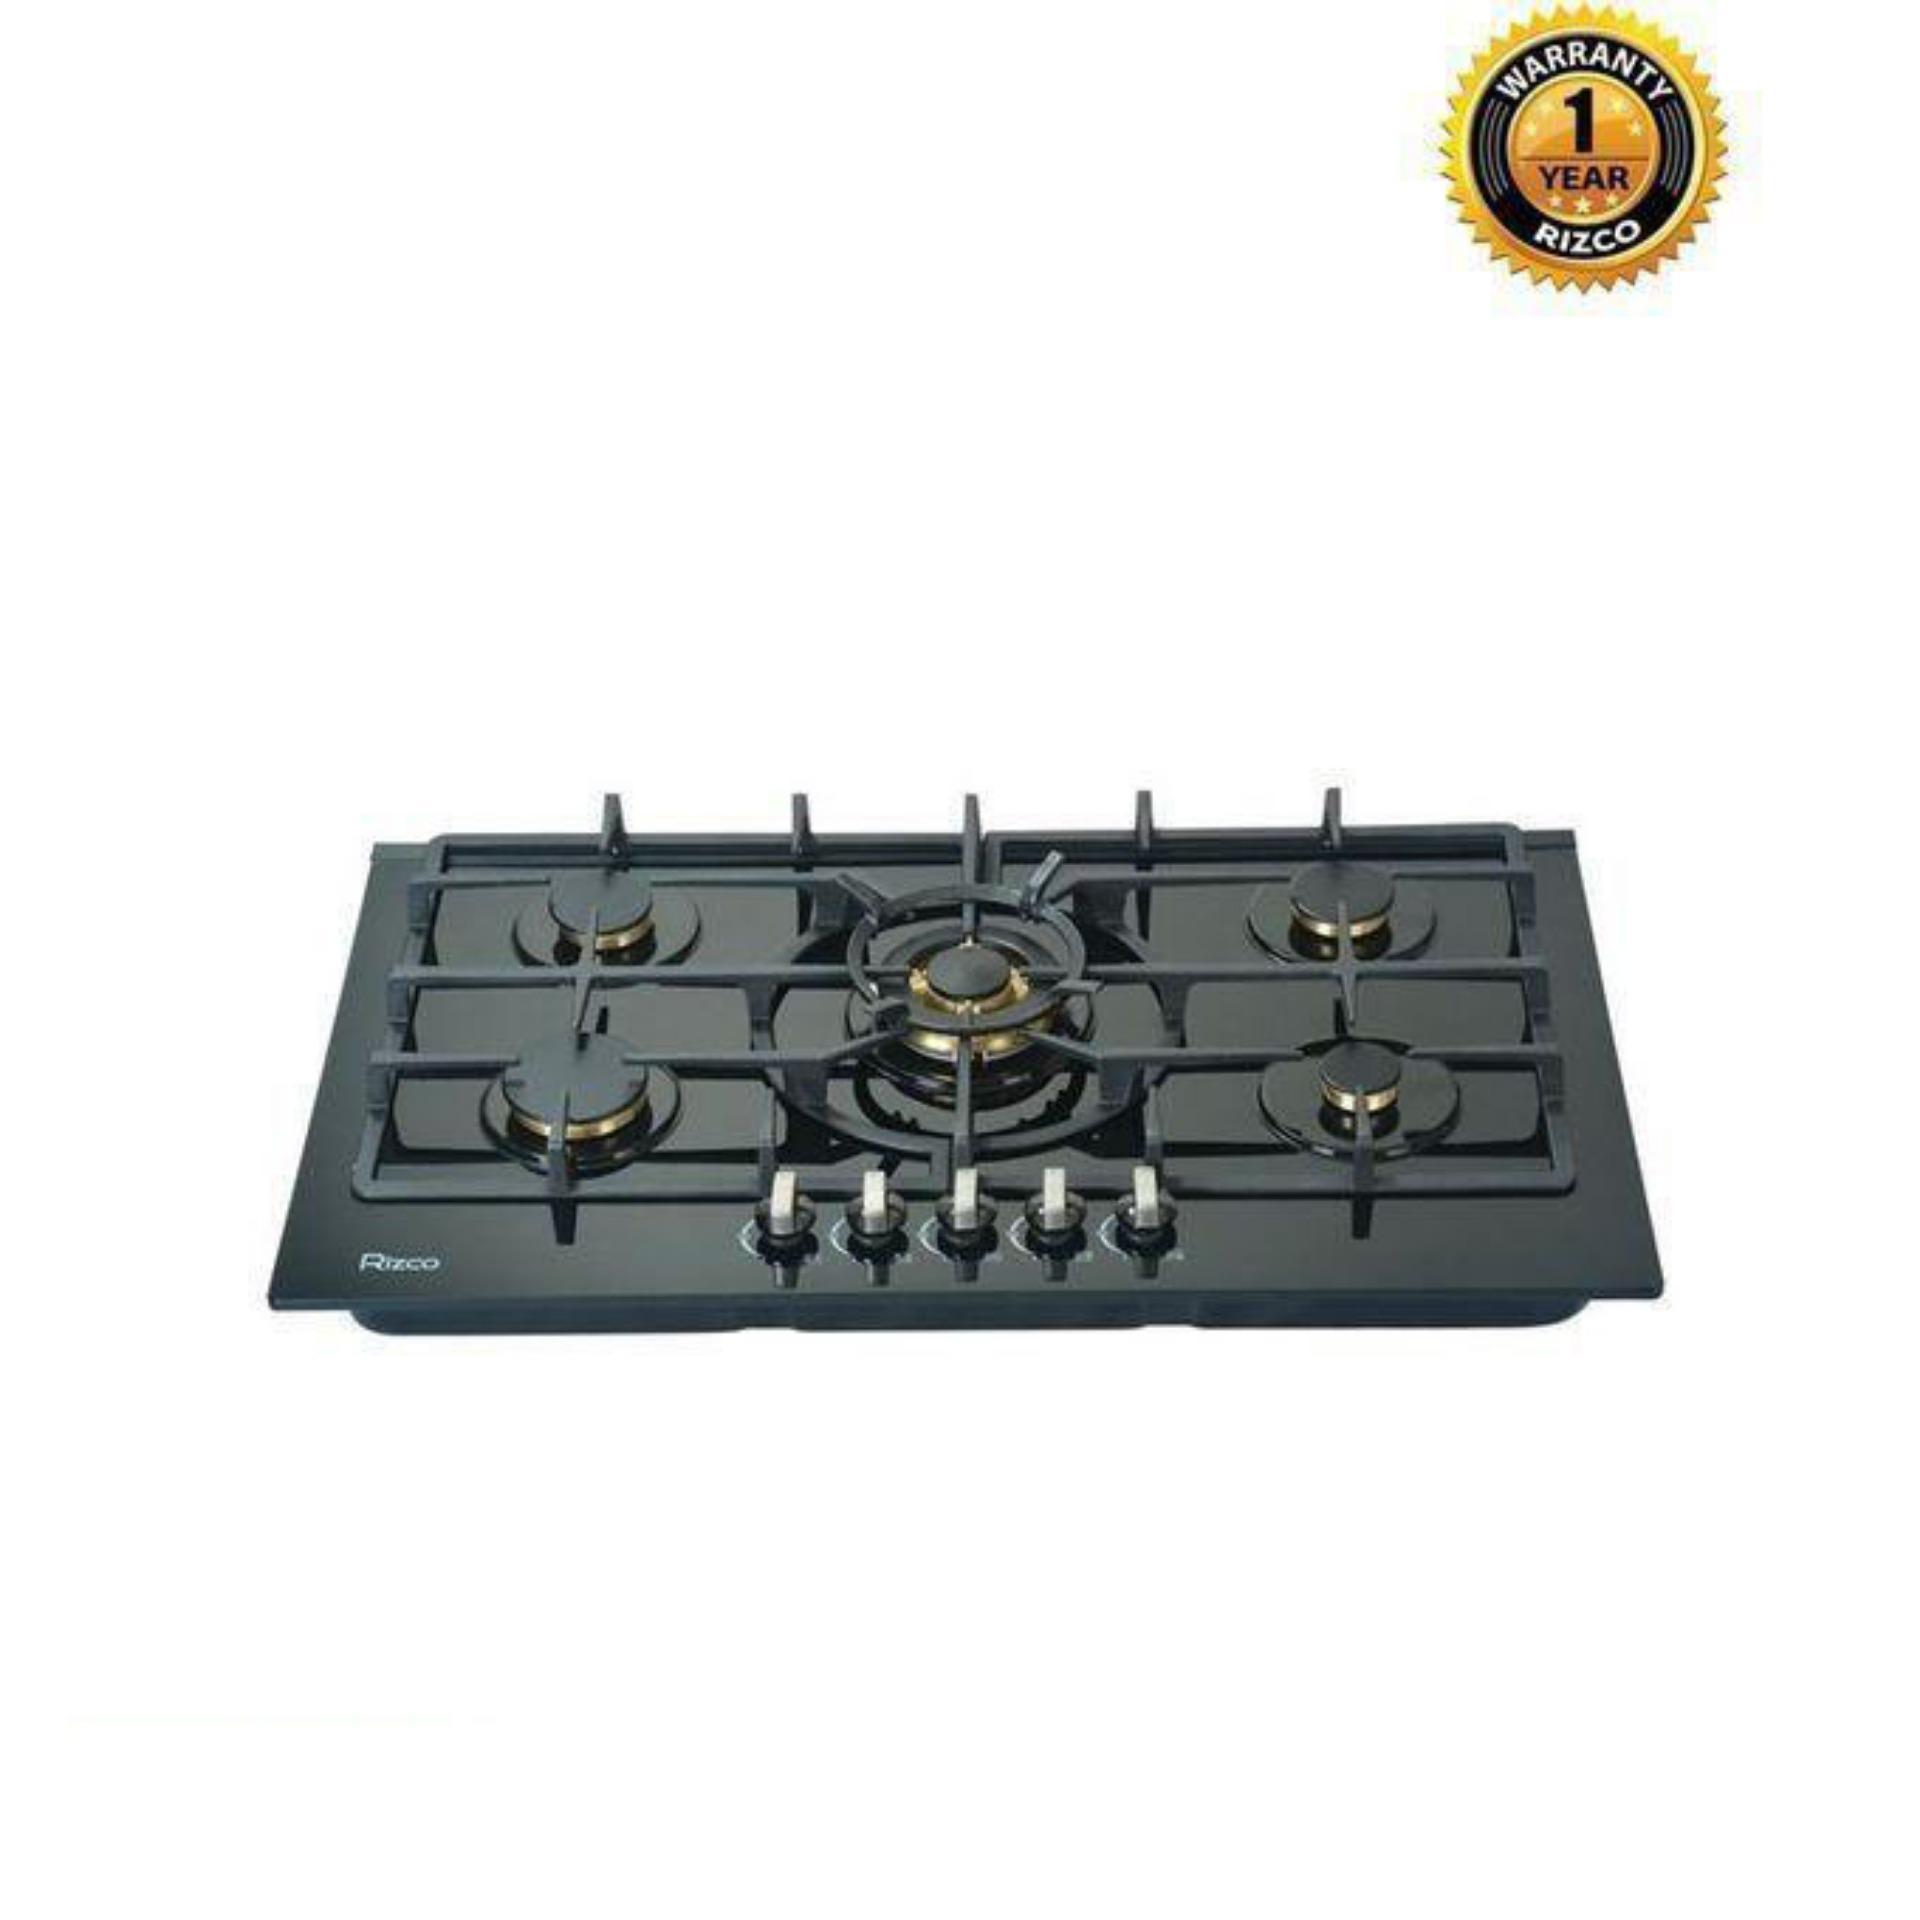 BG-50 Gas Burner LPG - Black